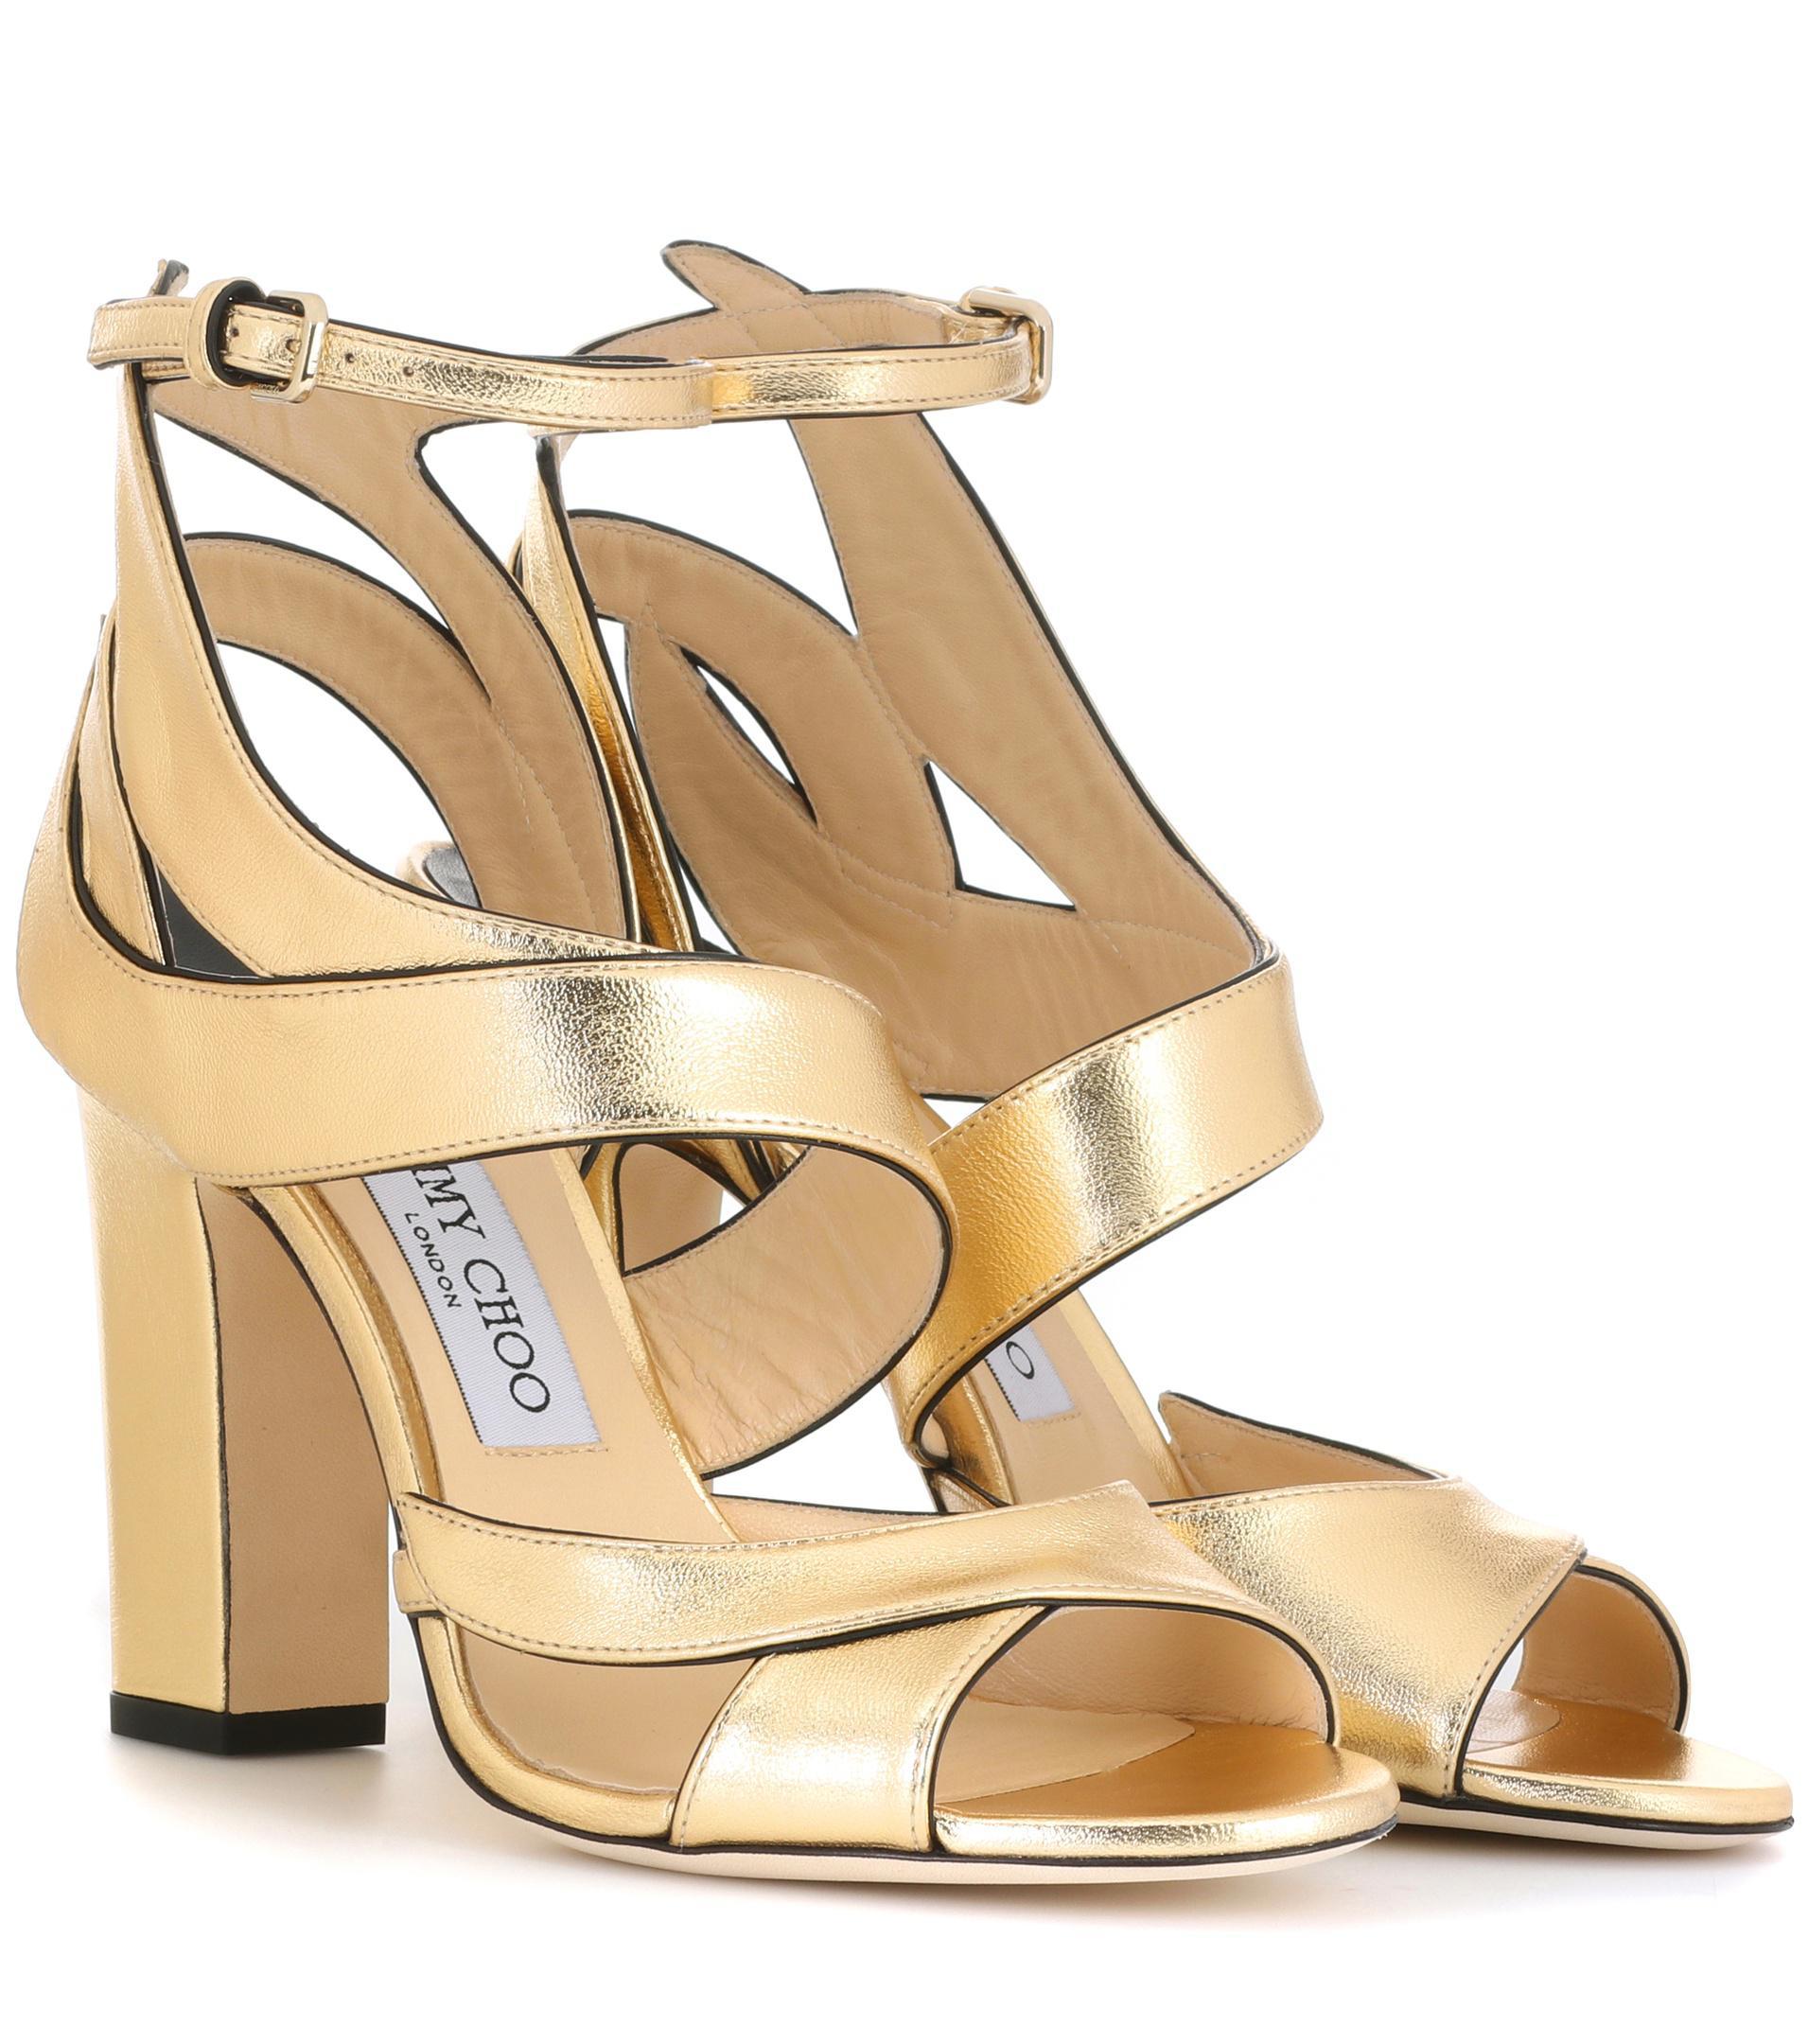 4d83c715e13 Jimmy Choo Falcon 100 Leather Sandals in Metallic - Lyst